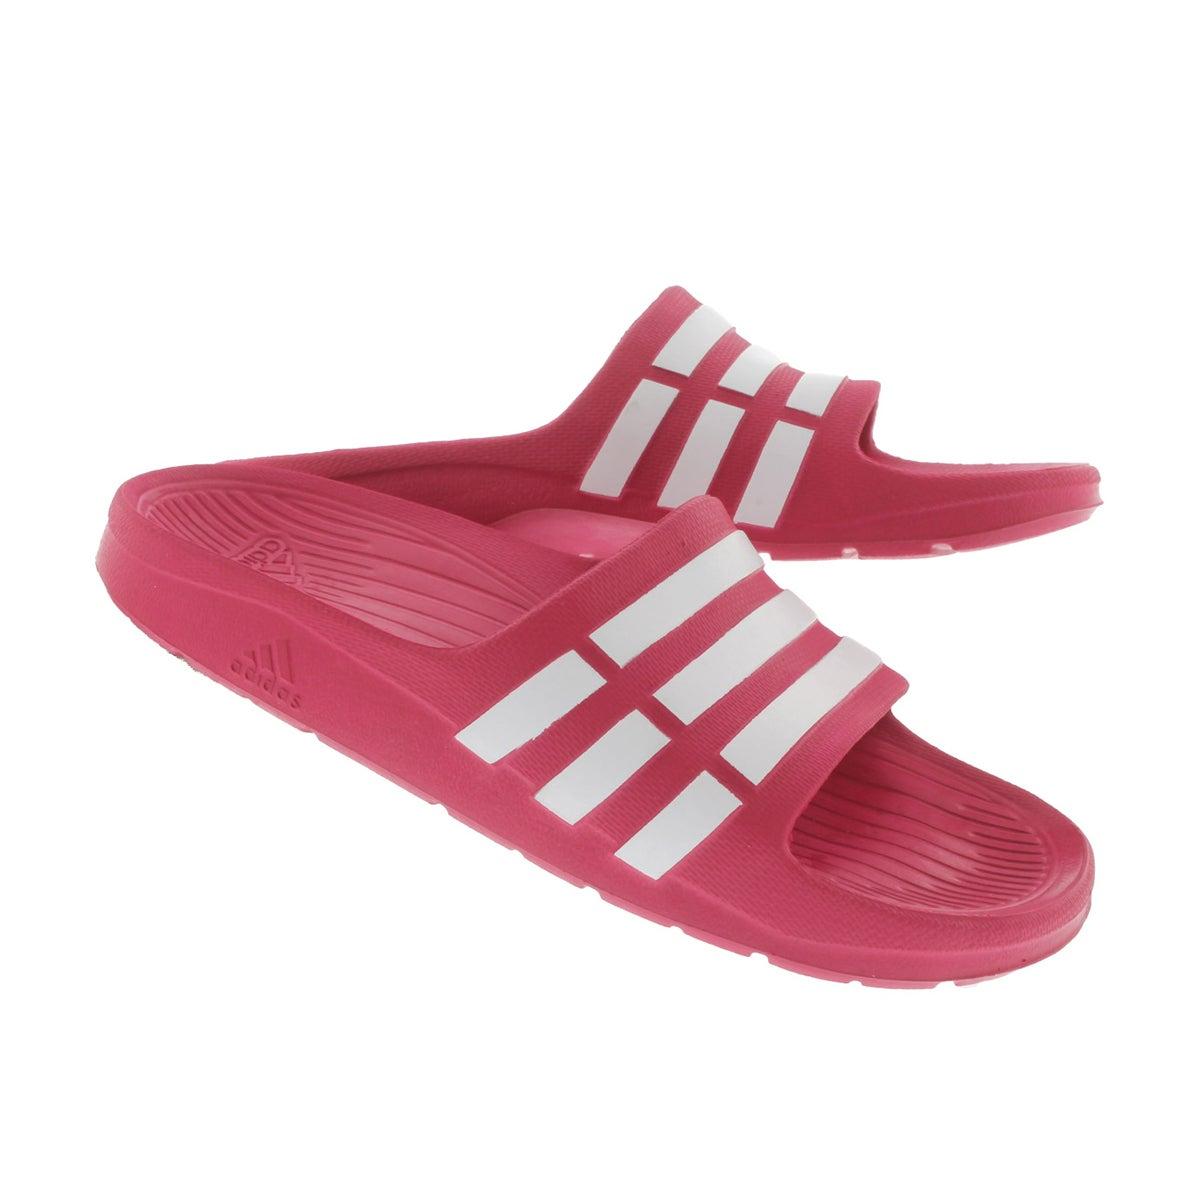 Grls Duramo pink slide sandal